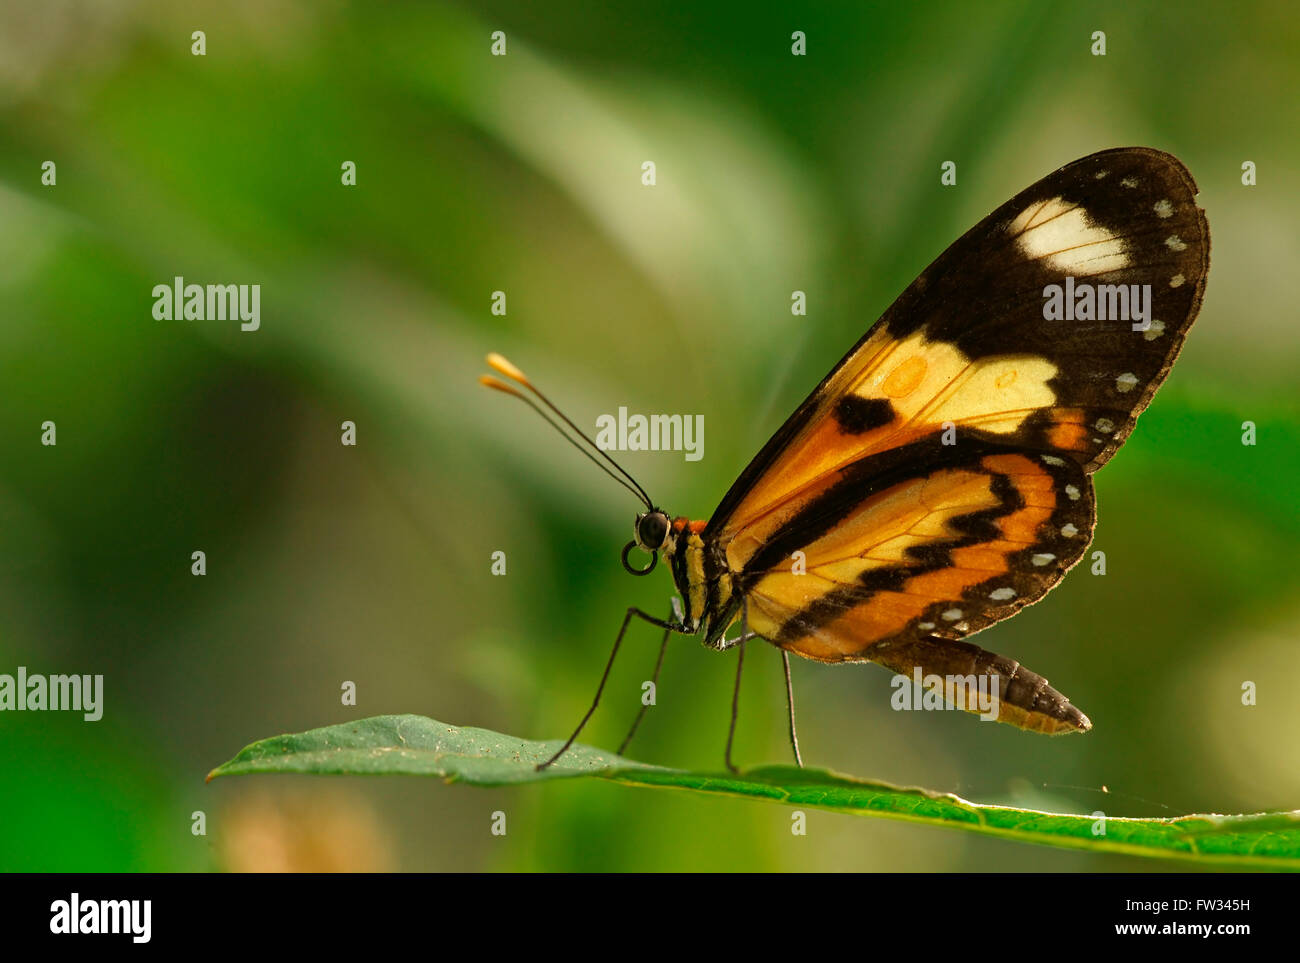 Nymphalidae (Nymphidae) Tropical butterfly (Mechanitis lysimnia), Iguazú National Park, Paraná, Brazil - Stock Image